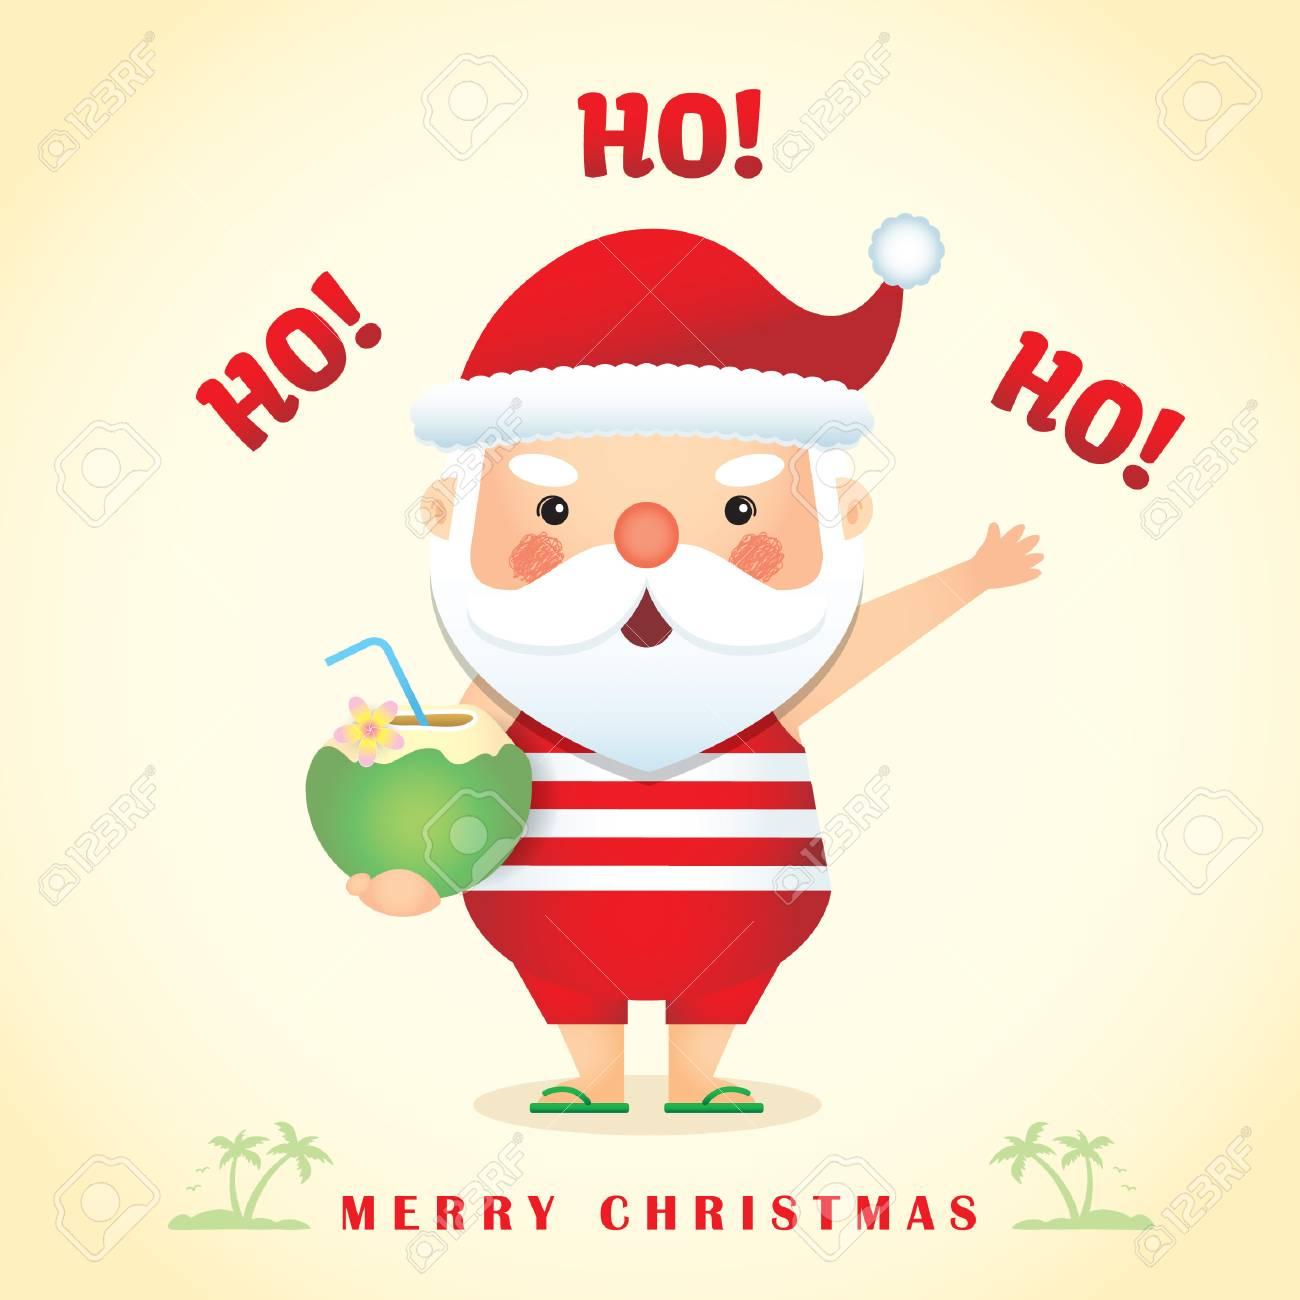 Merry Christmas Greetings With Cute Cartoon Santa Claus Wearing